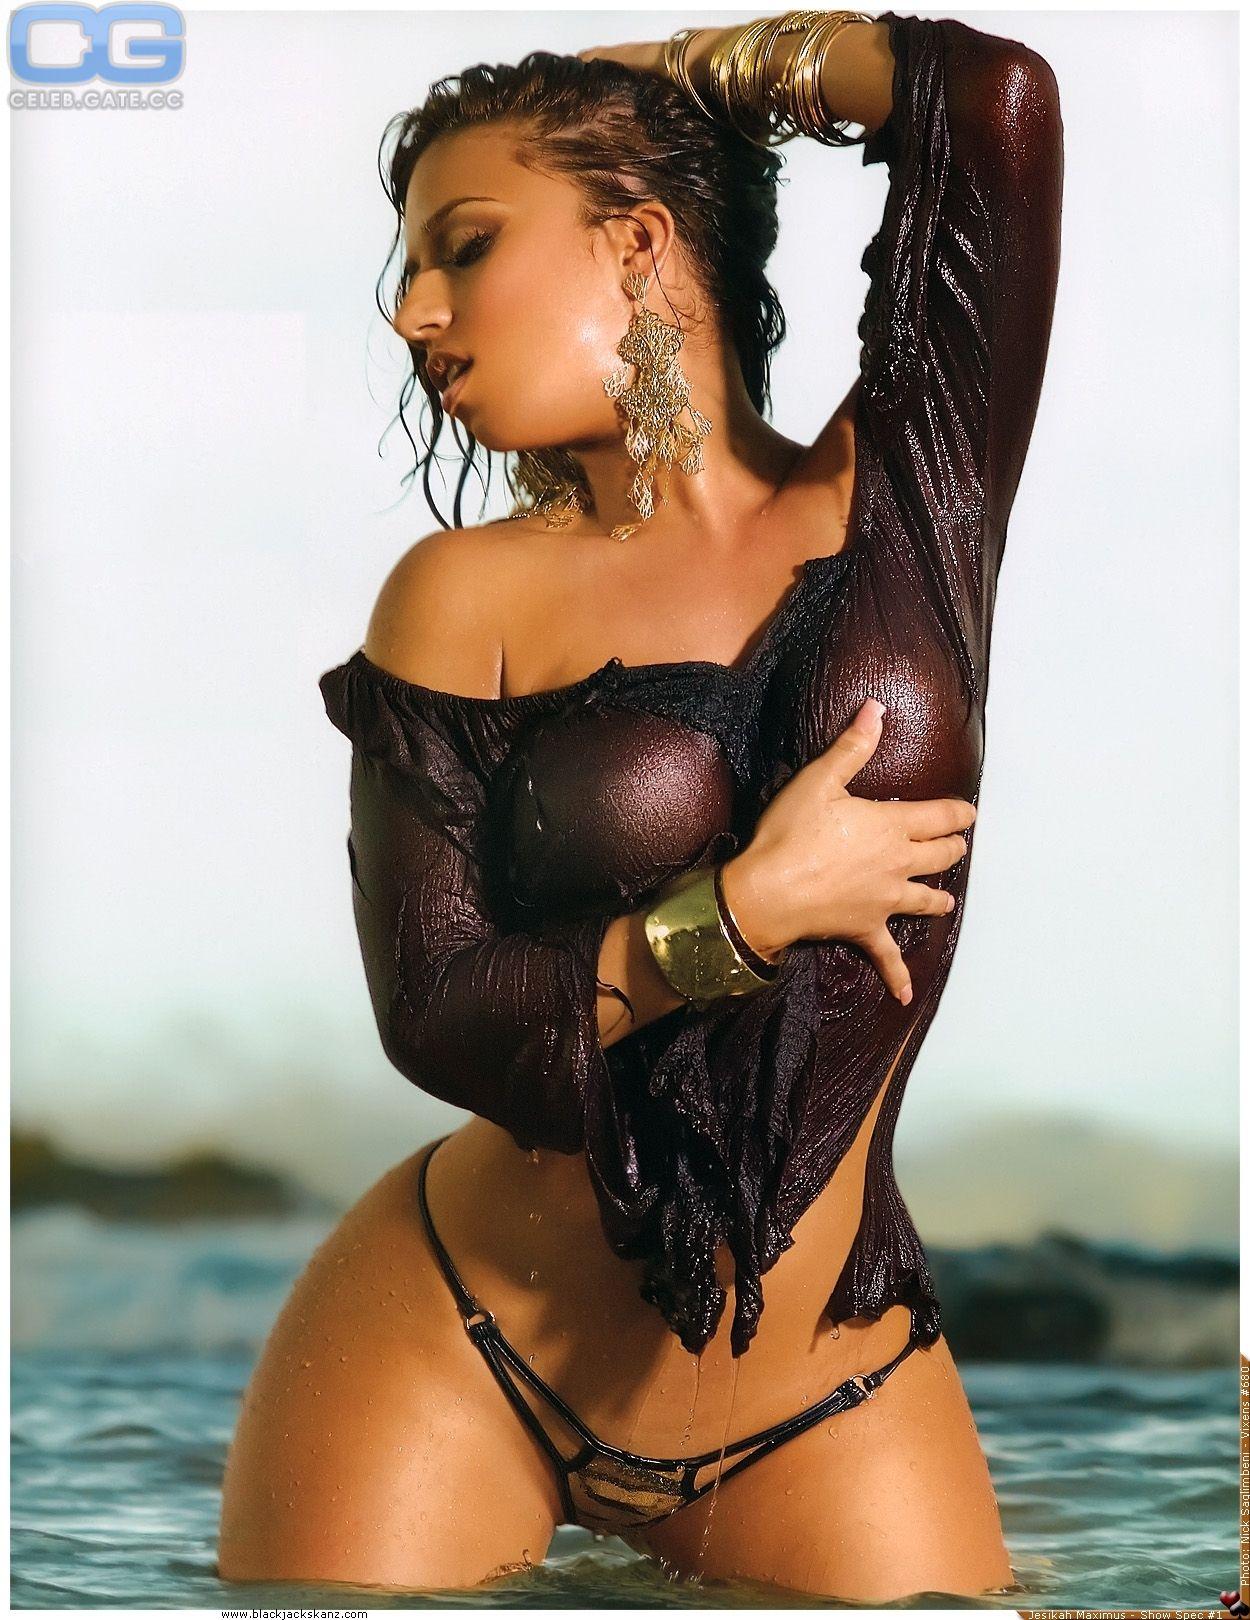 Bikini models wild